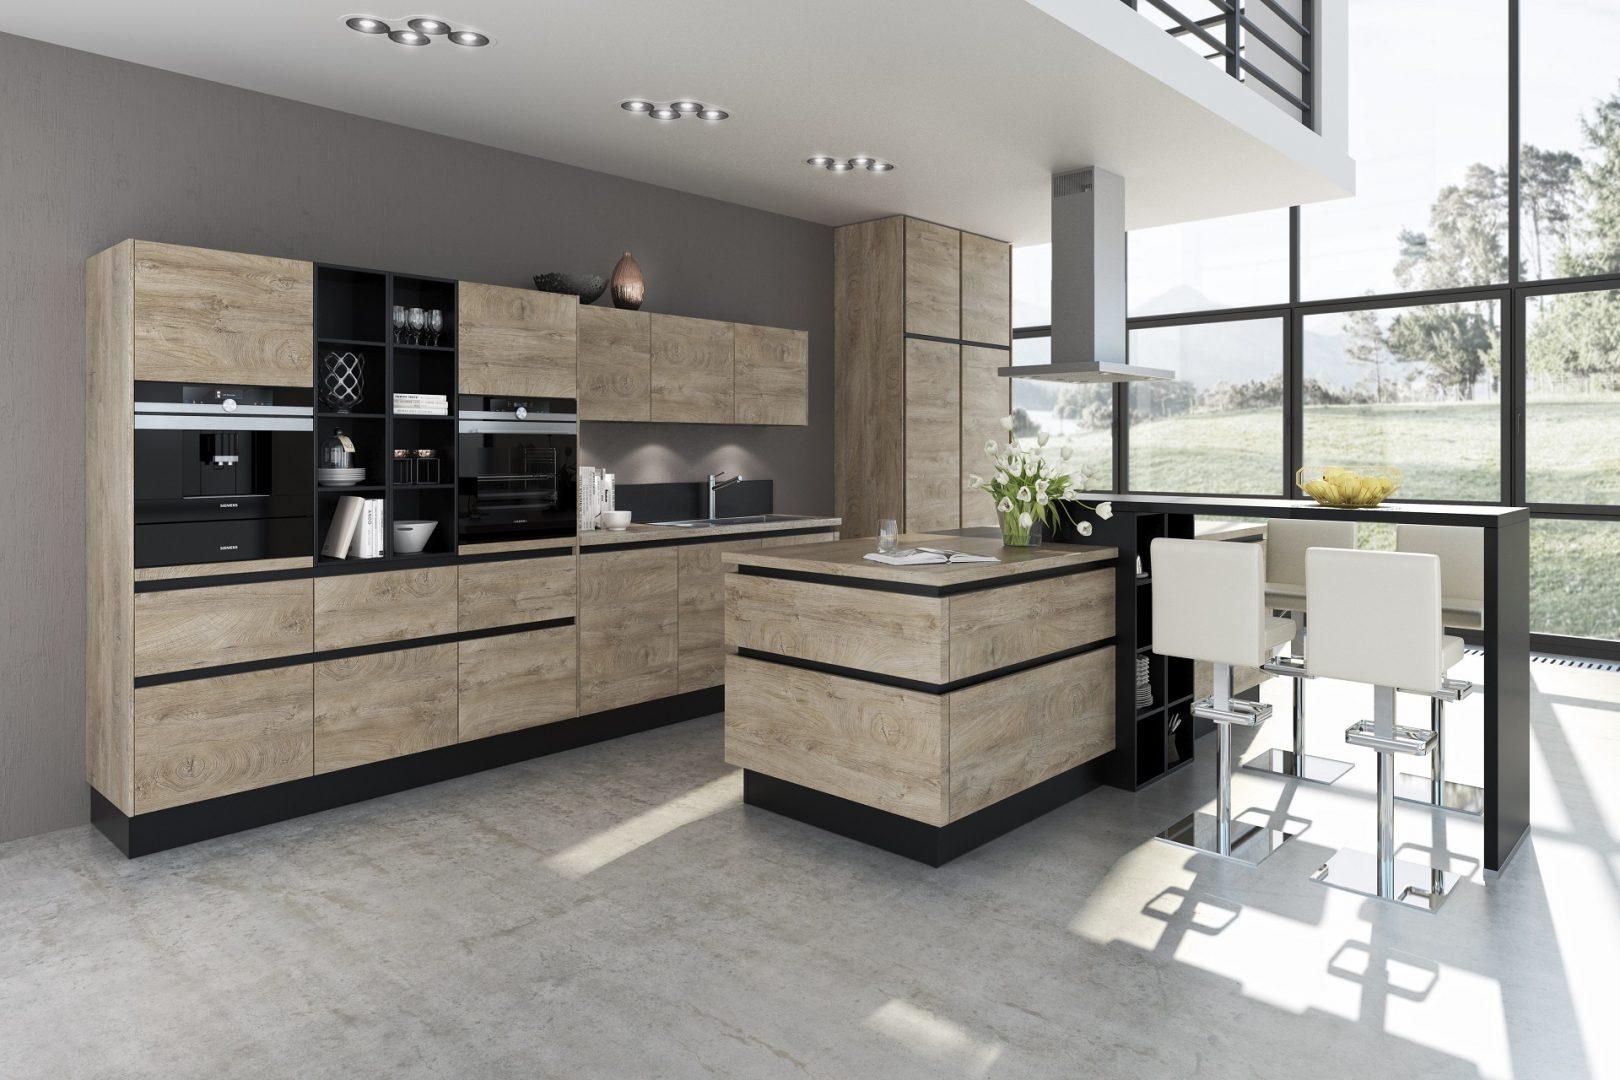 This kitchen by German supplier Brigitte features the AURA range, a wooden effect laminate in finish 'Cantaro Oak'